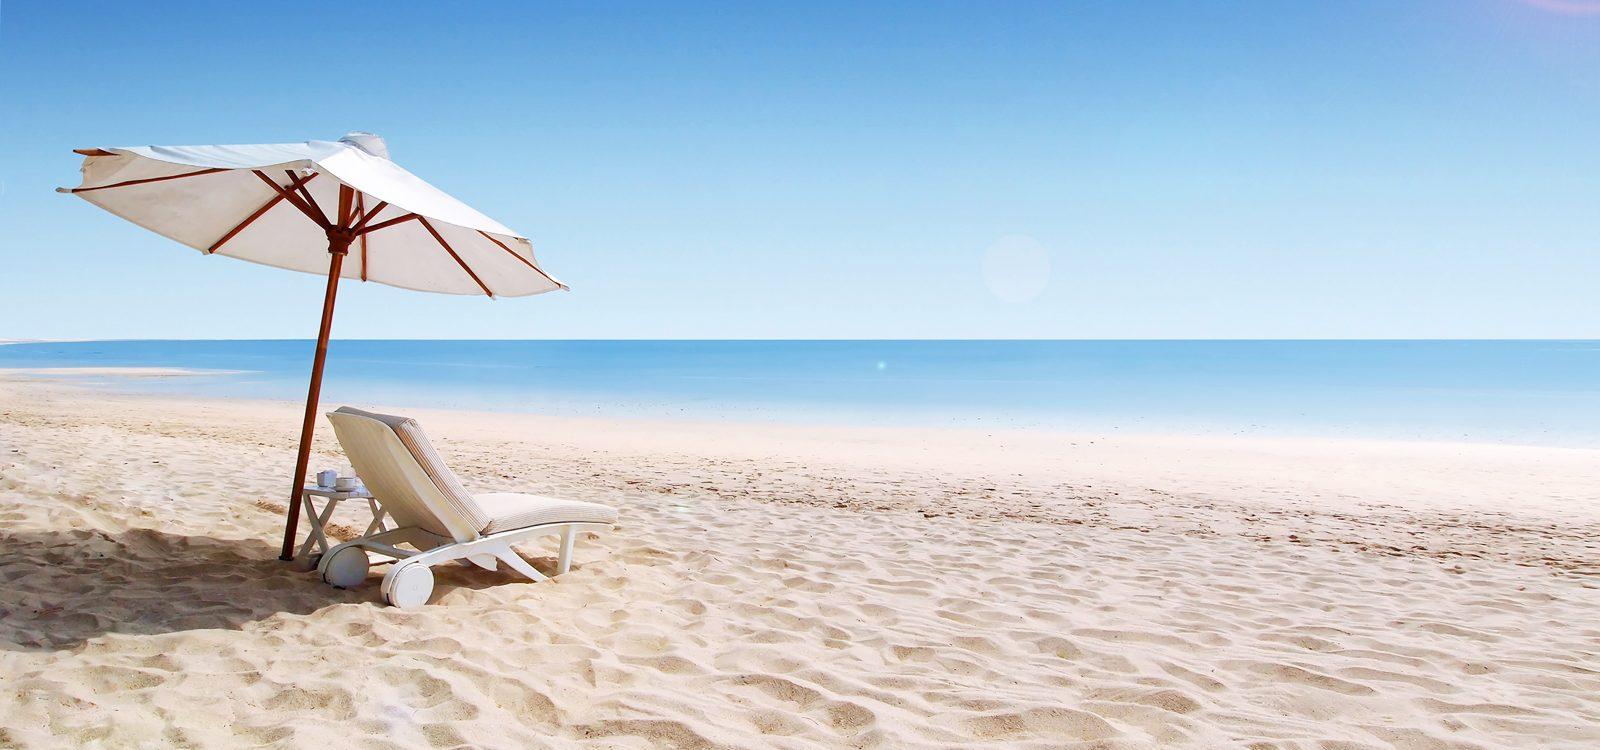 playa saidia marruecos